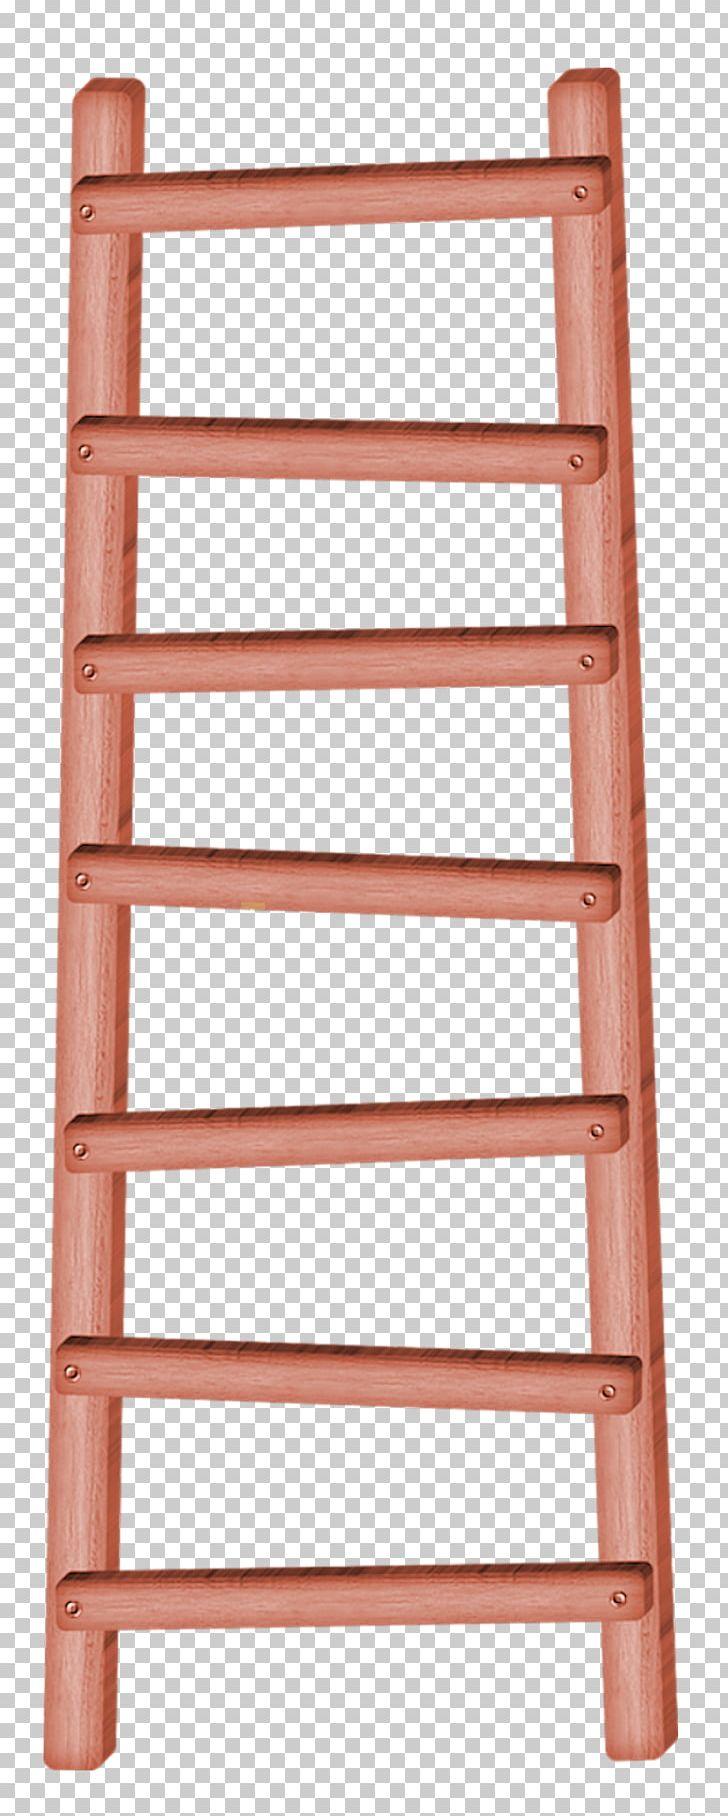 Ladder PNG, Clipart, Ladder Free PNG Download